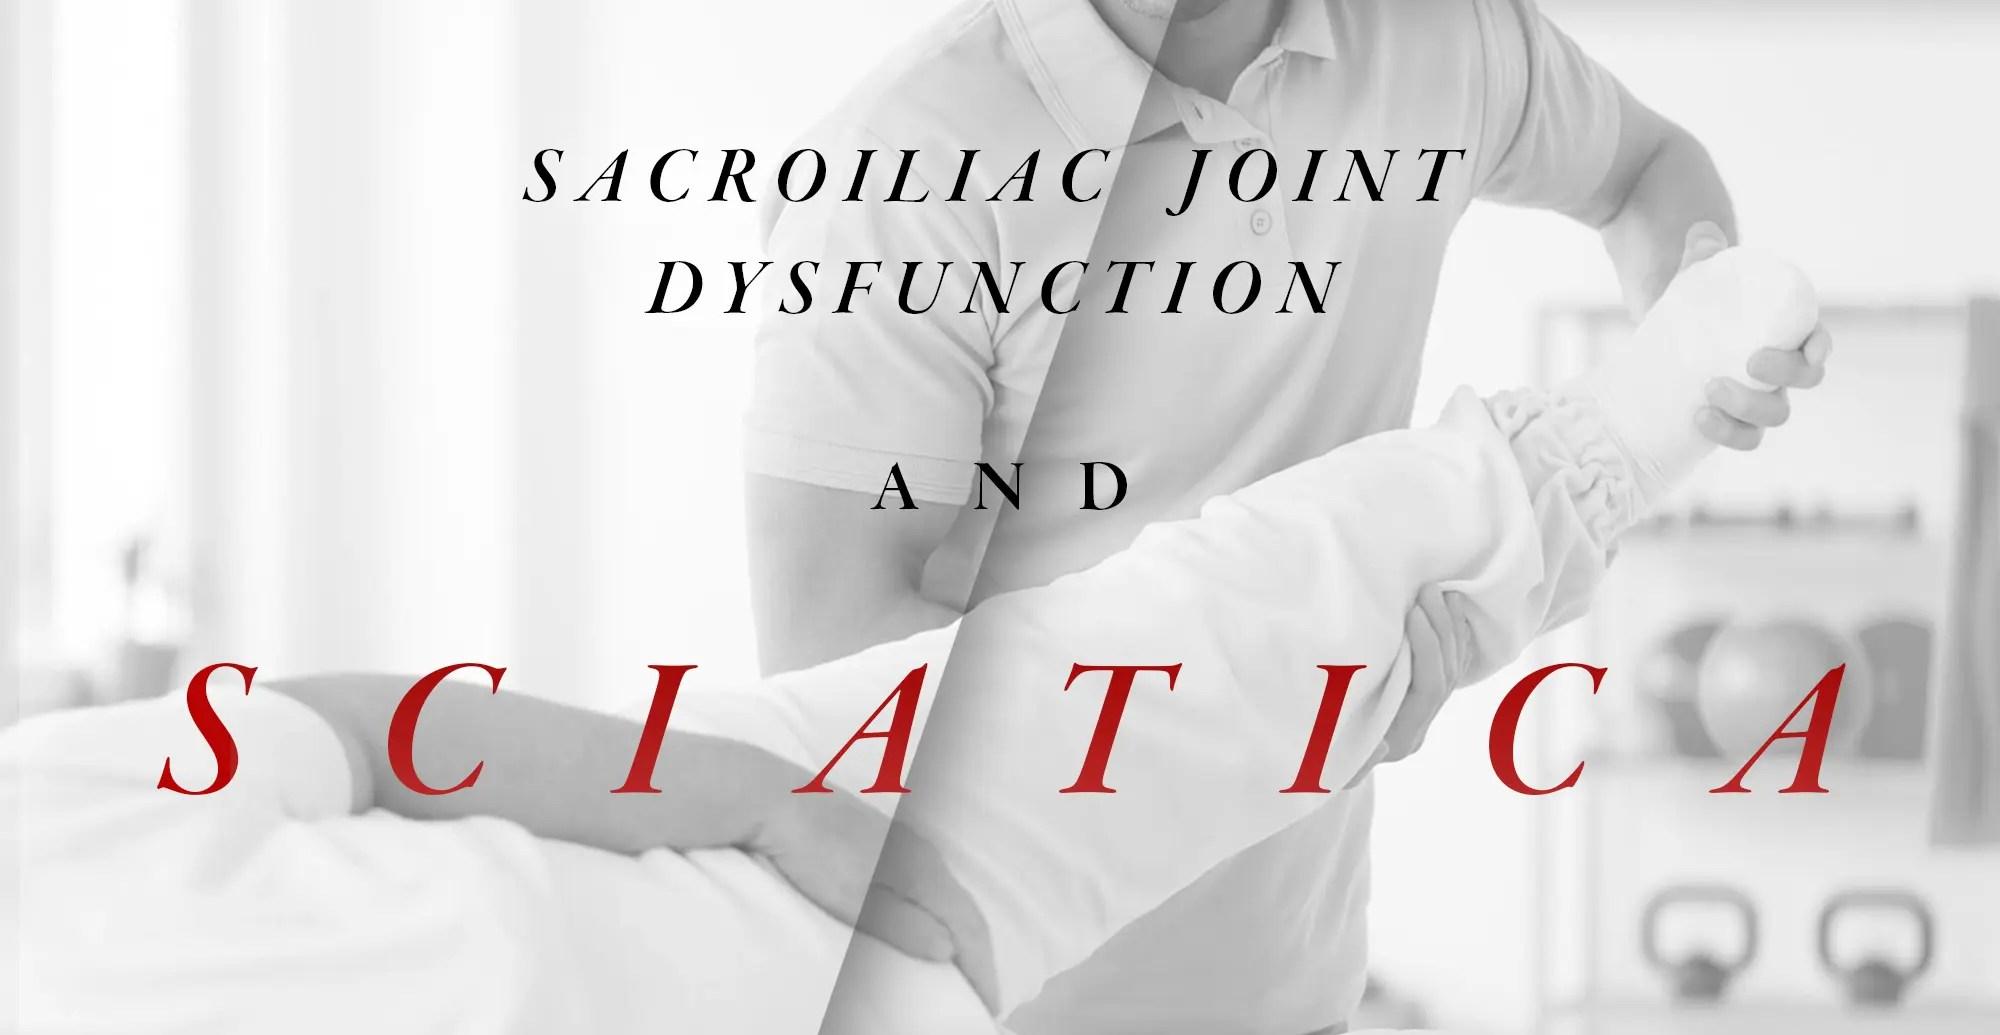 Esiste la disfunzione sacroiliaca?